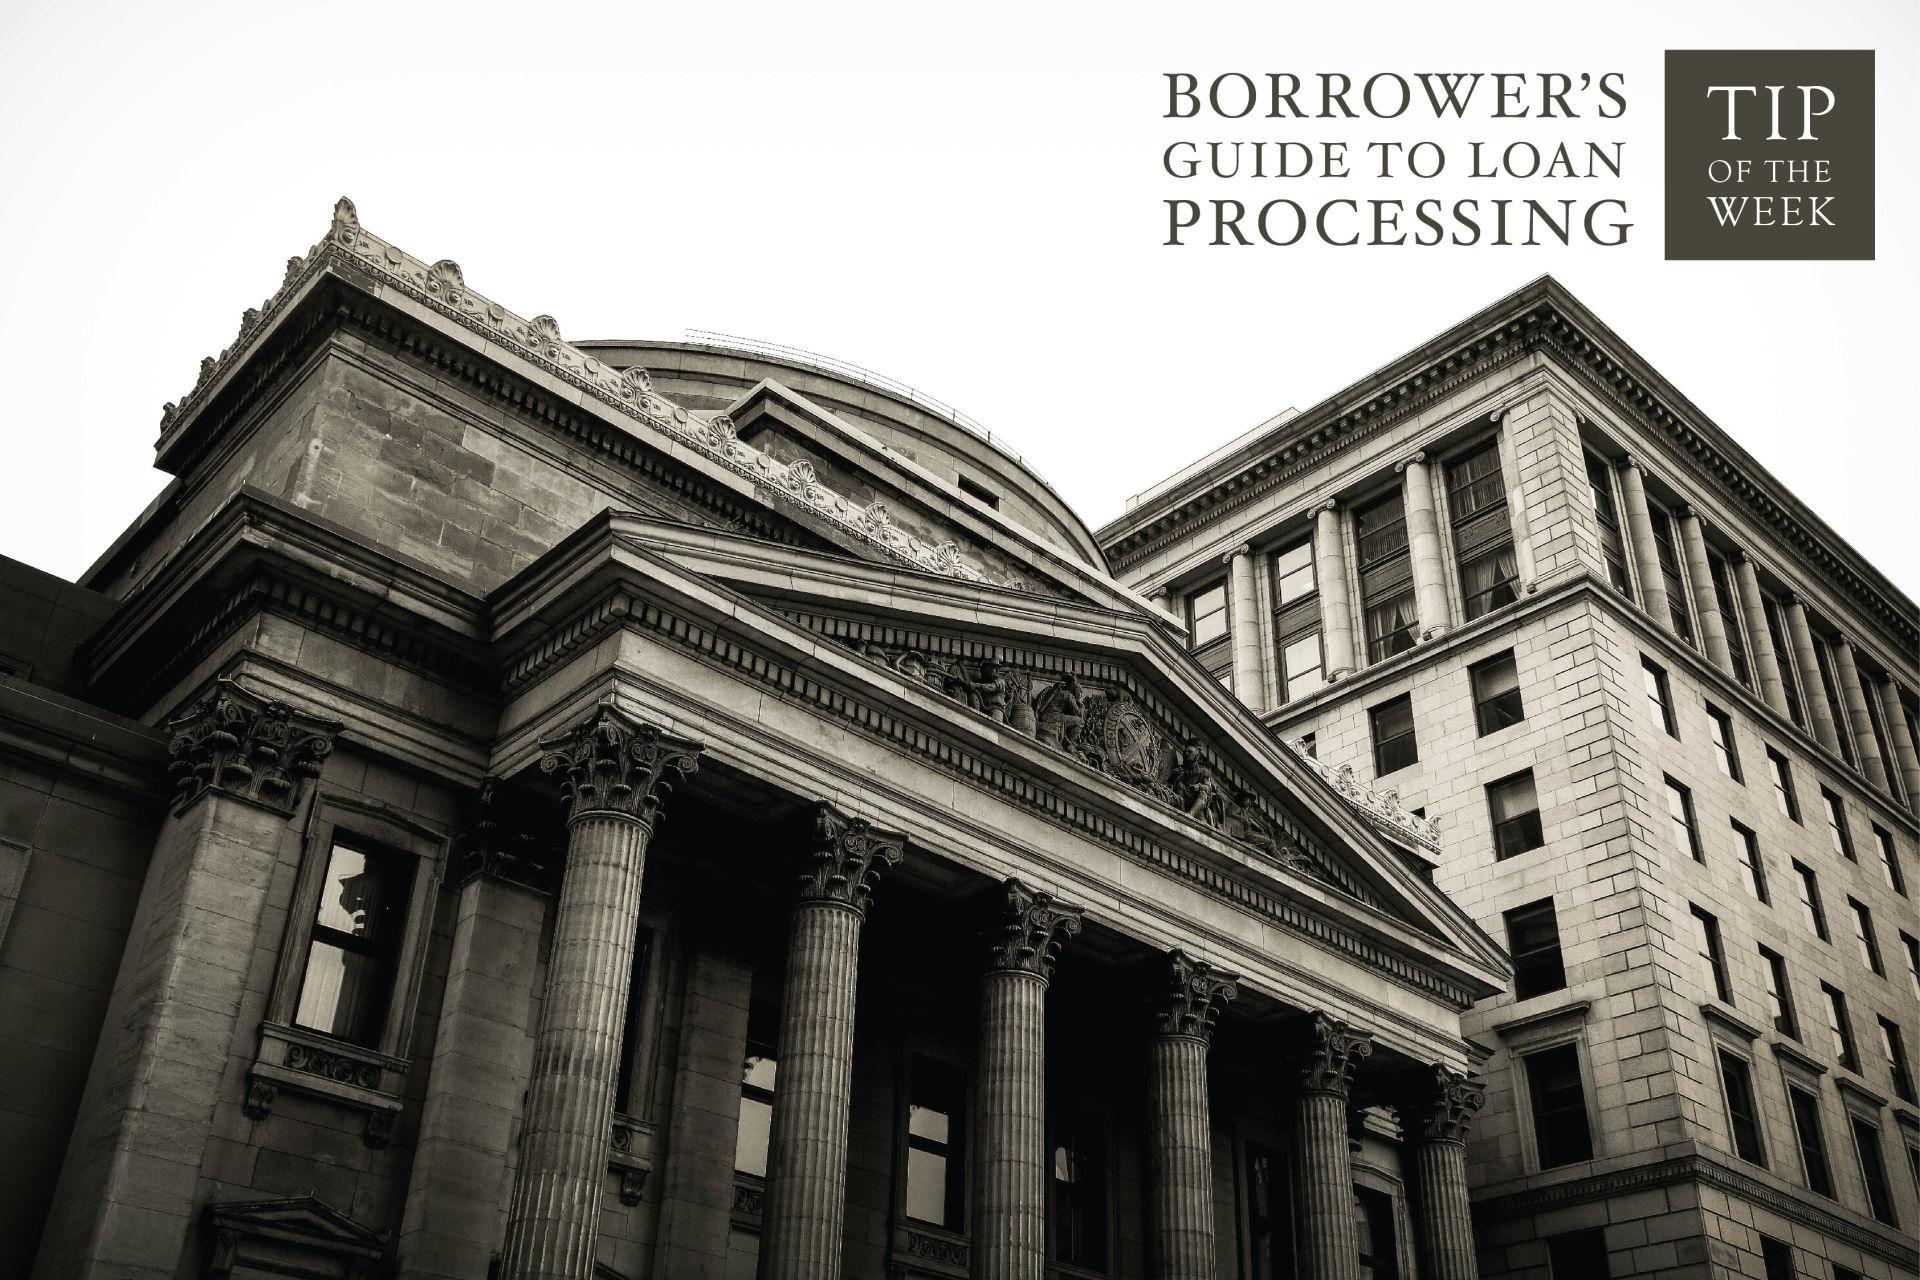 Borrower's Guide toLoan Processing